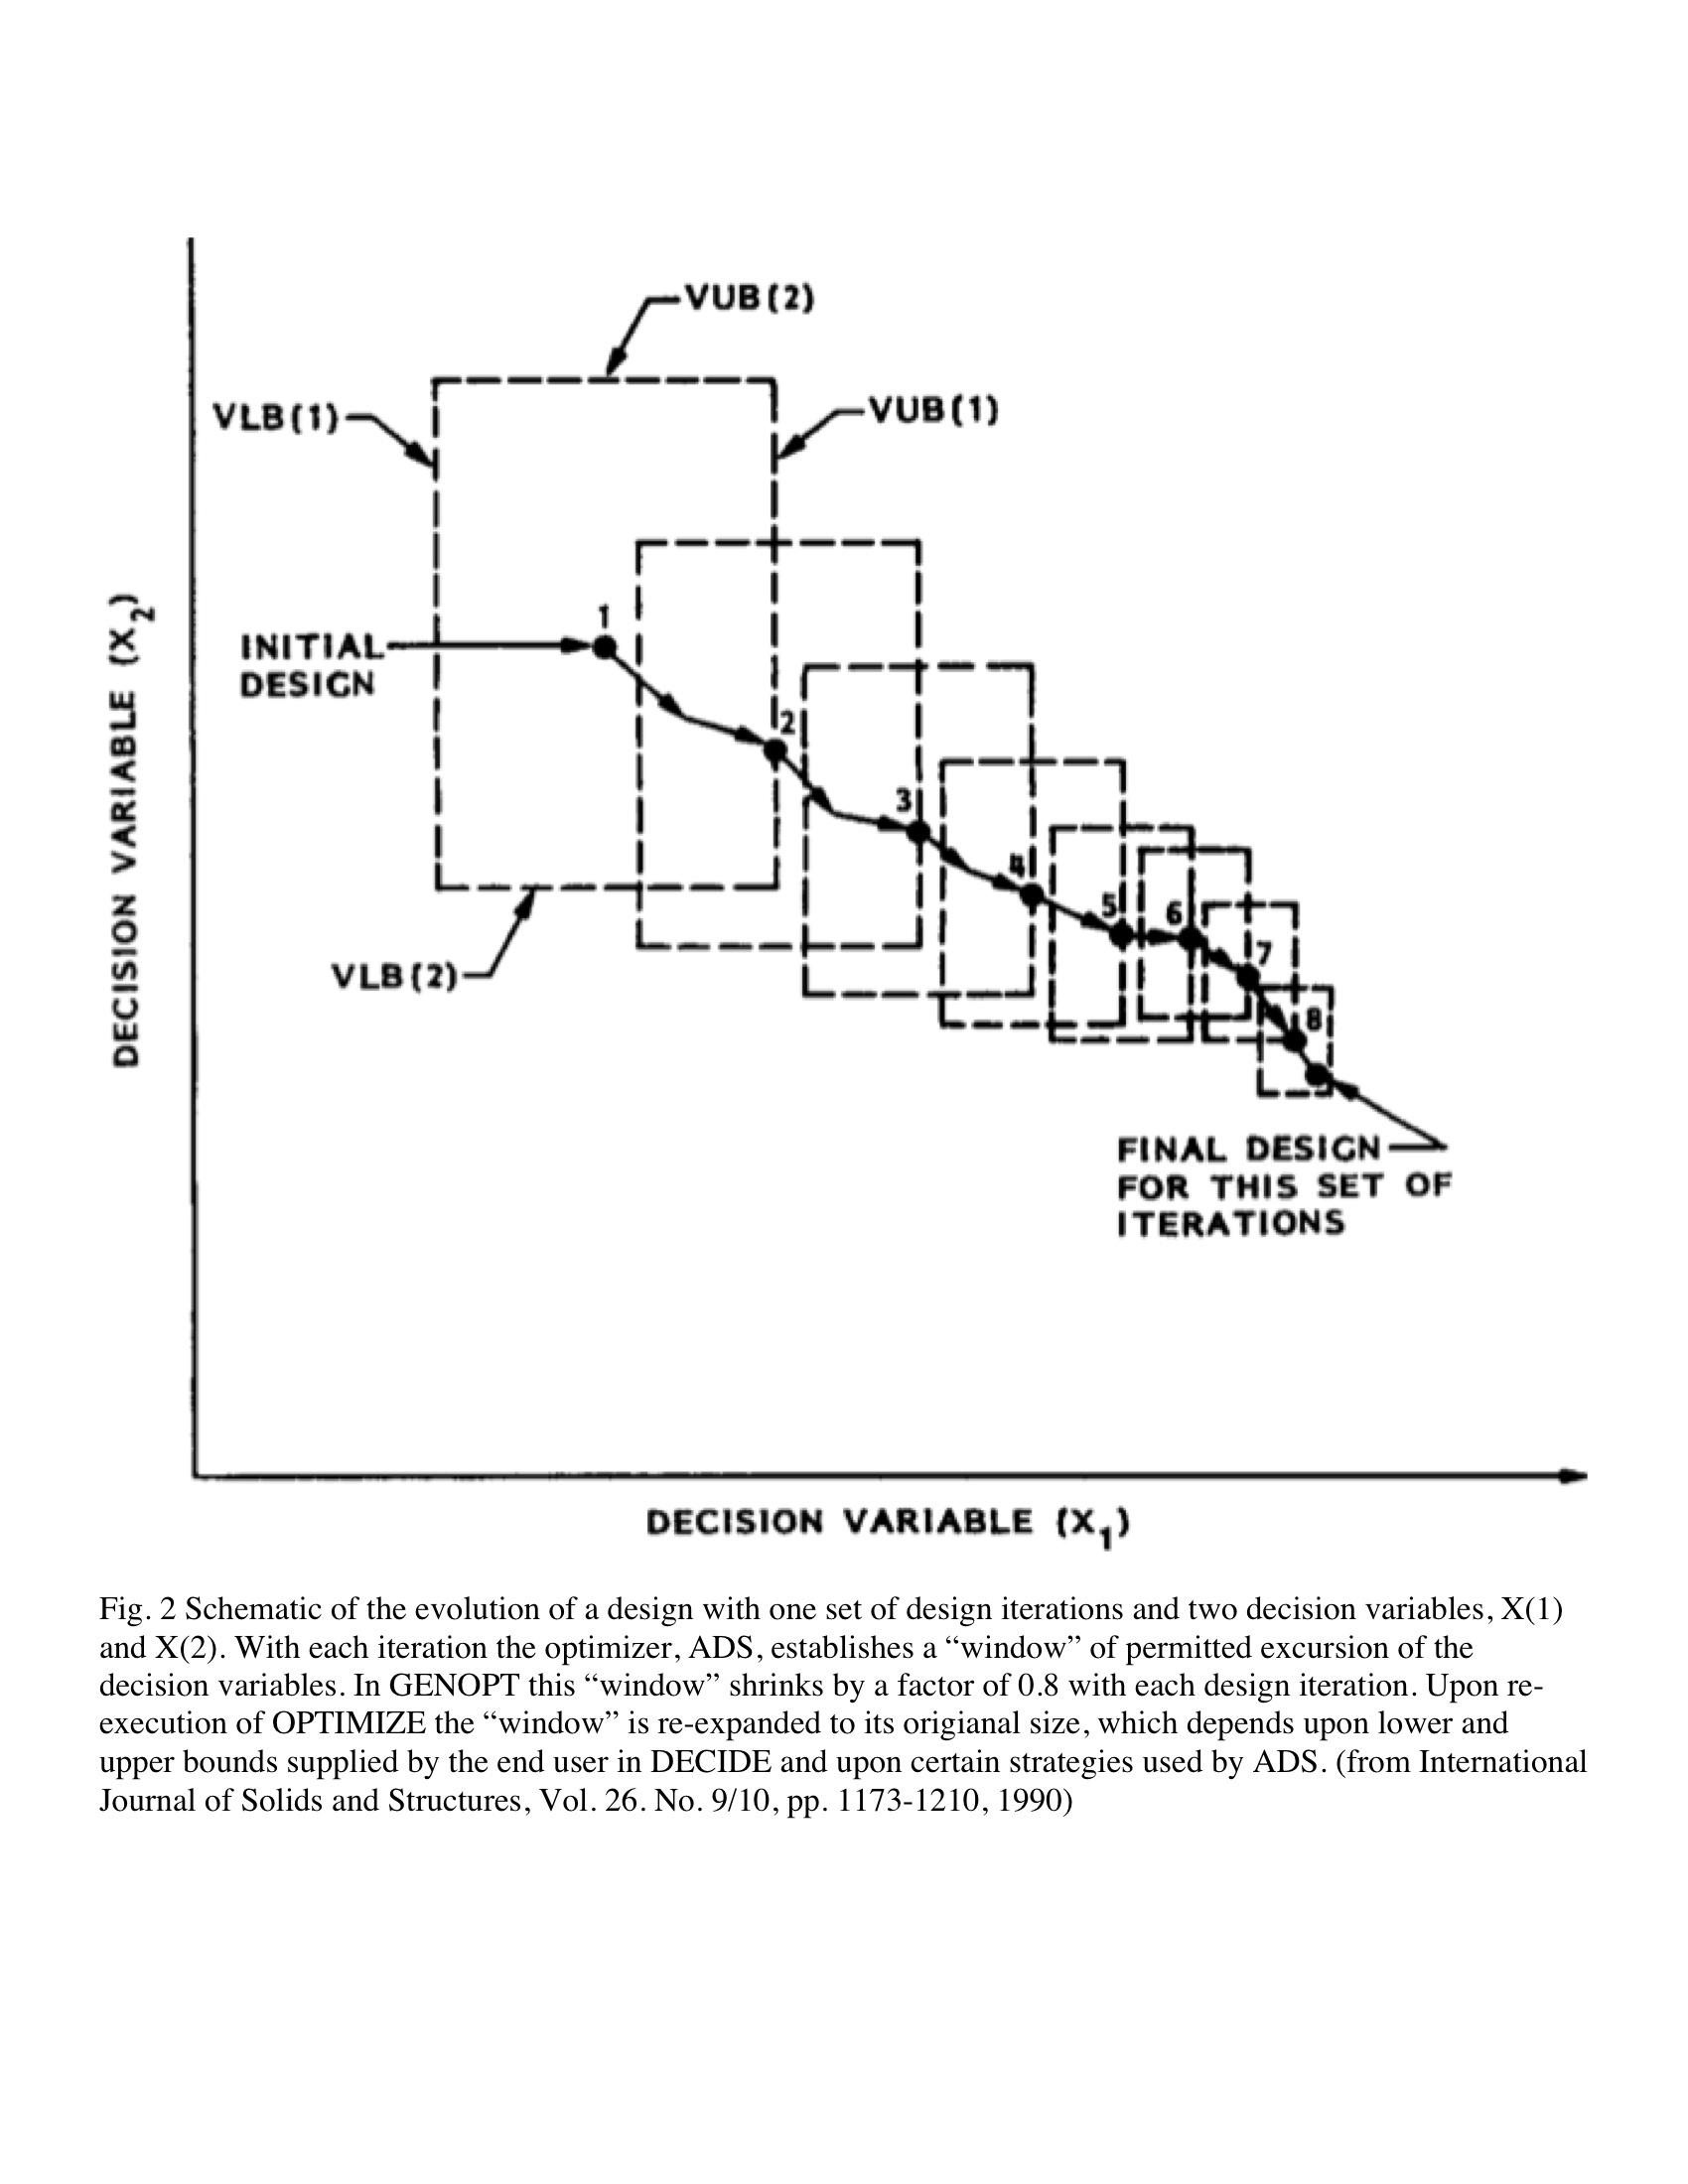 Vlb Wiring Diagram 2000 Gmc Sierra 1500 Fuse Box Gmp075 3 Wiring Model – Extra M2n61 Arpc Fan Wiring Diagram